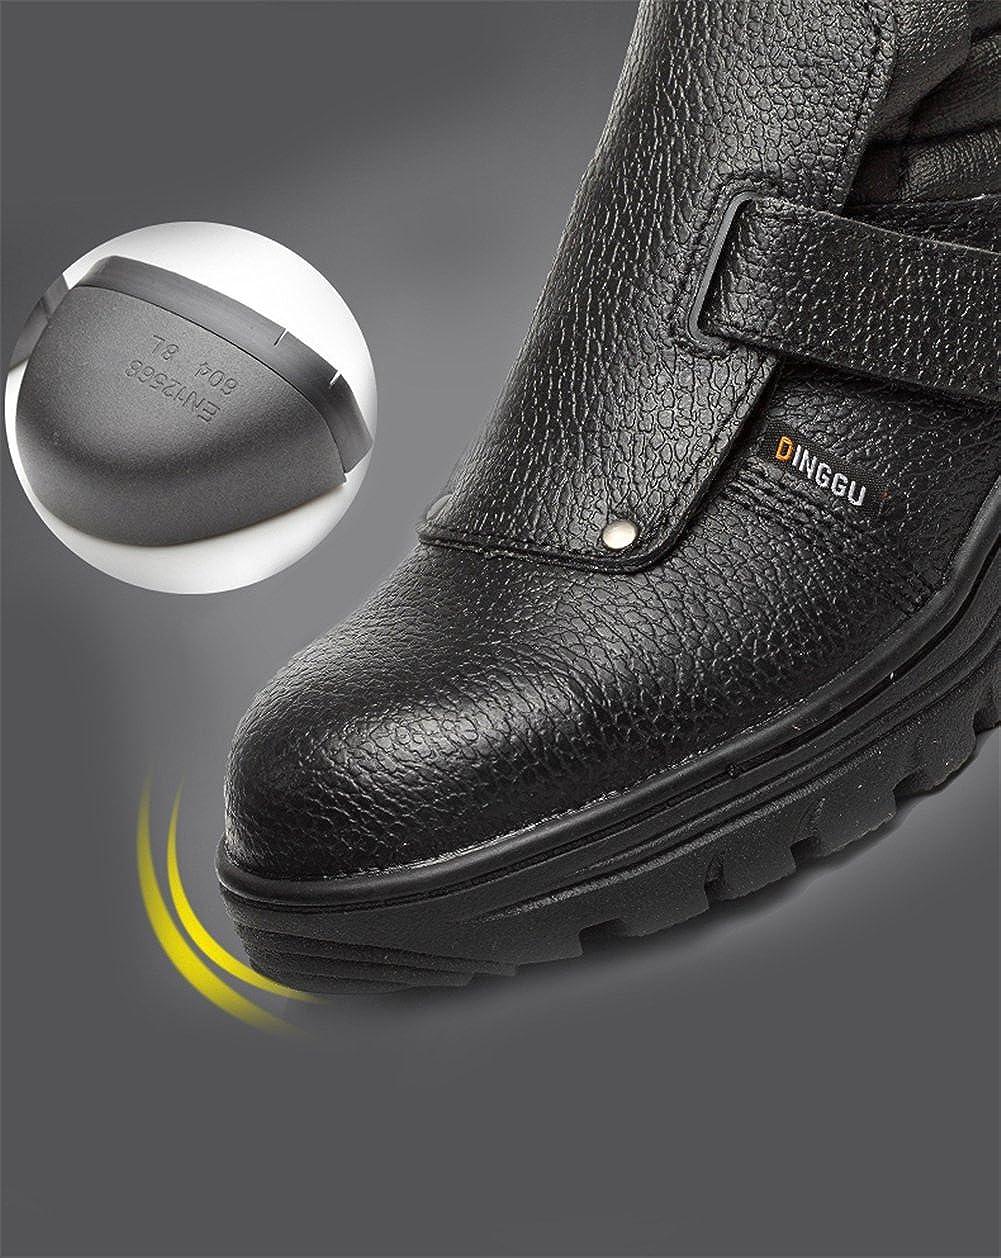 AILU Arbeitsschuhe S3 Herren Wasserdicht Stahlkappe Schwei/ßschuhe Lsolierung Klettverschluss Sicherheitsschuhe Ohne Schn/ürsenkel